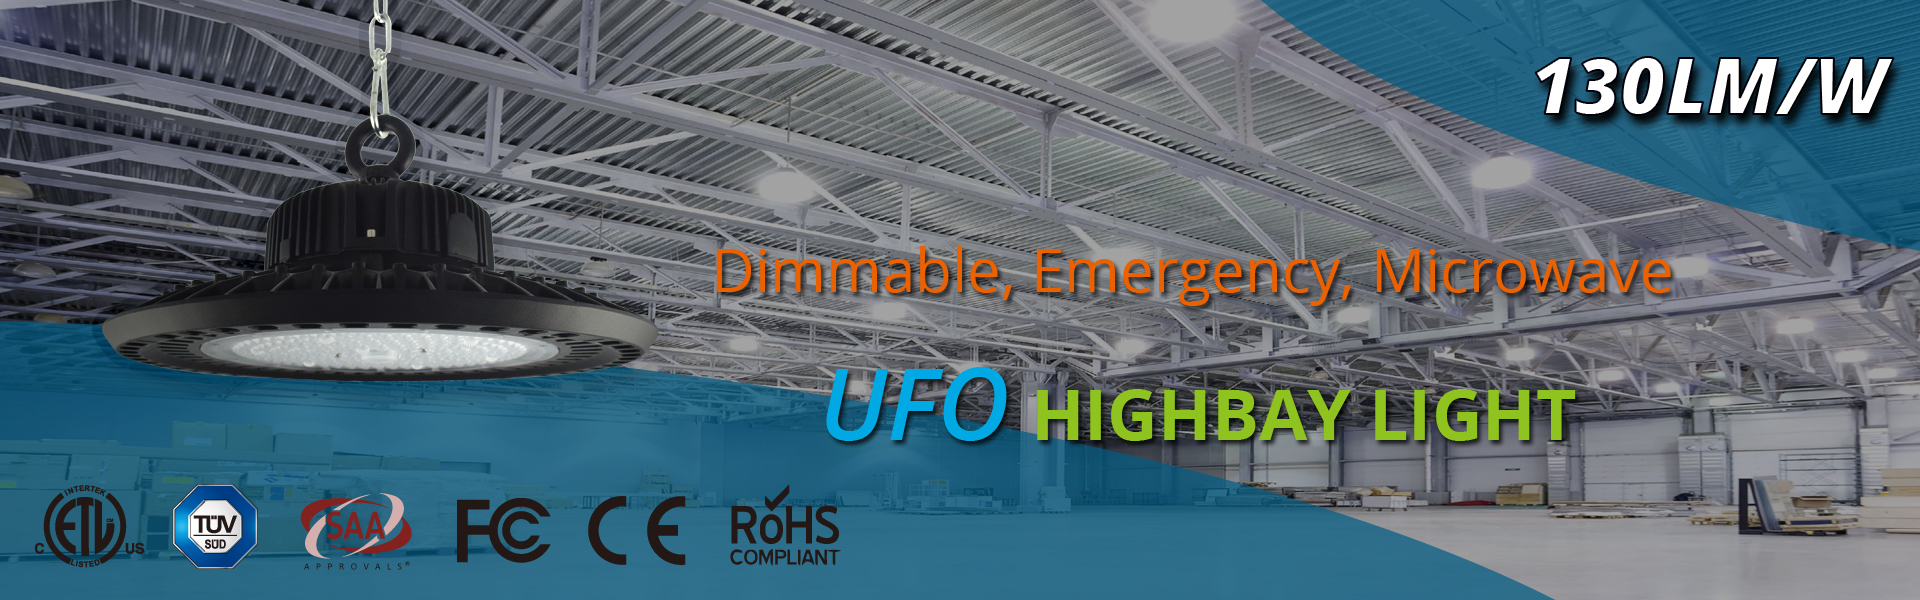 ufo led highbay light cree led meanwell driver 130lm/w